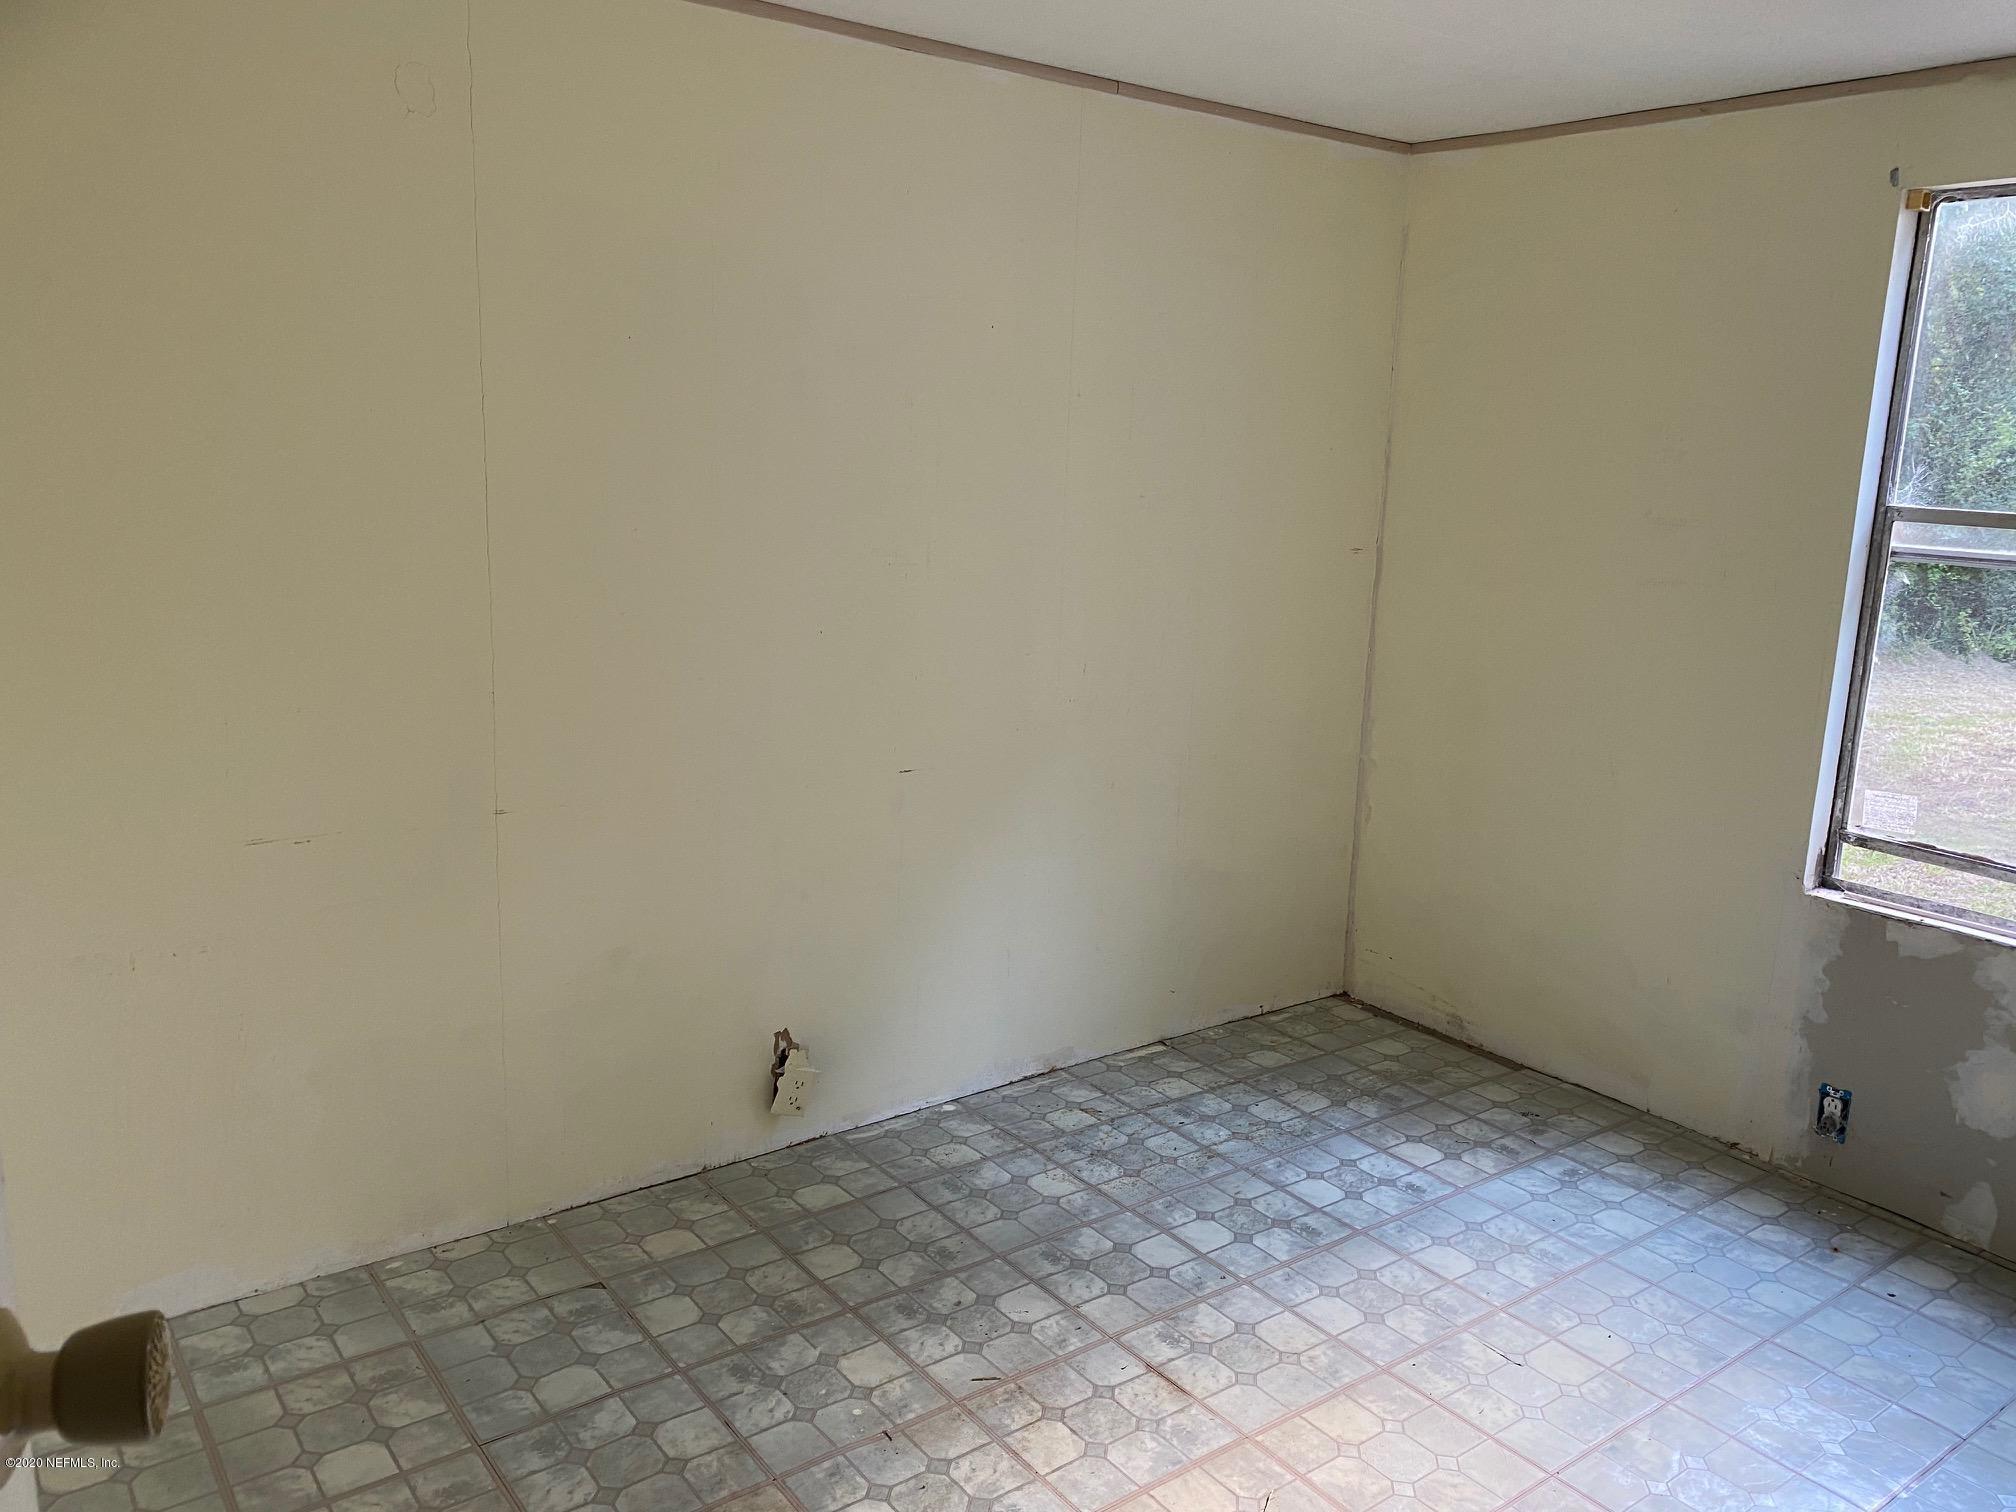 54143 JEANNIE, CALLAHAN, FLORIDA 32011, 3 Bedrooms Bedrooms, ,2 BathroomsBathrooms,Residential,For sale,JEANNIE,1059883